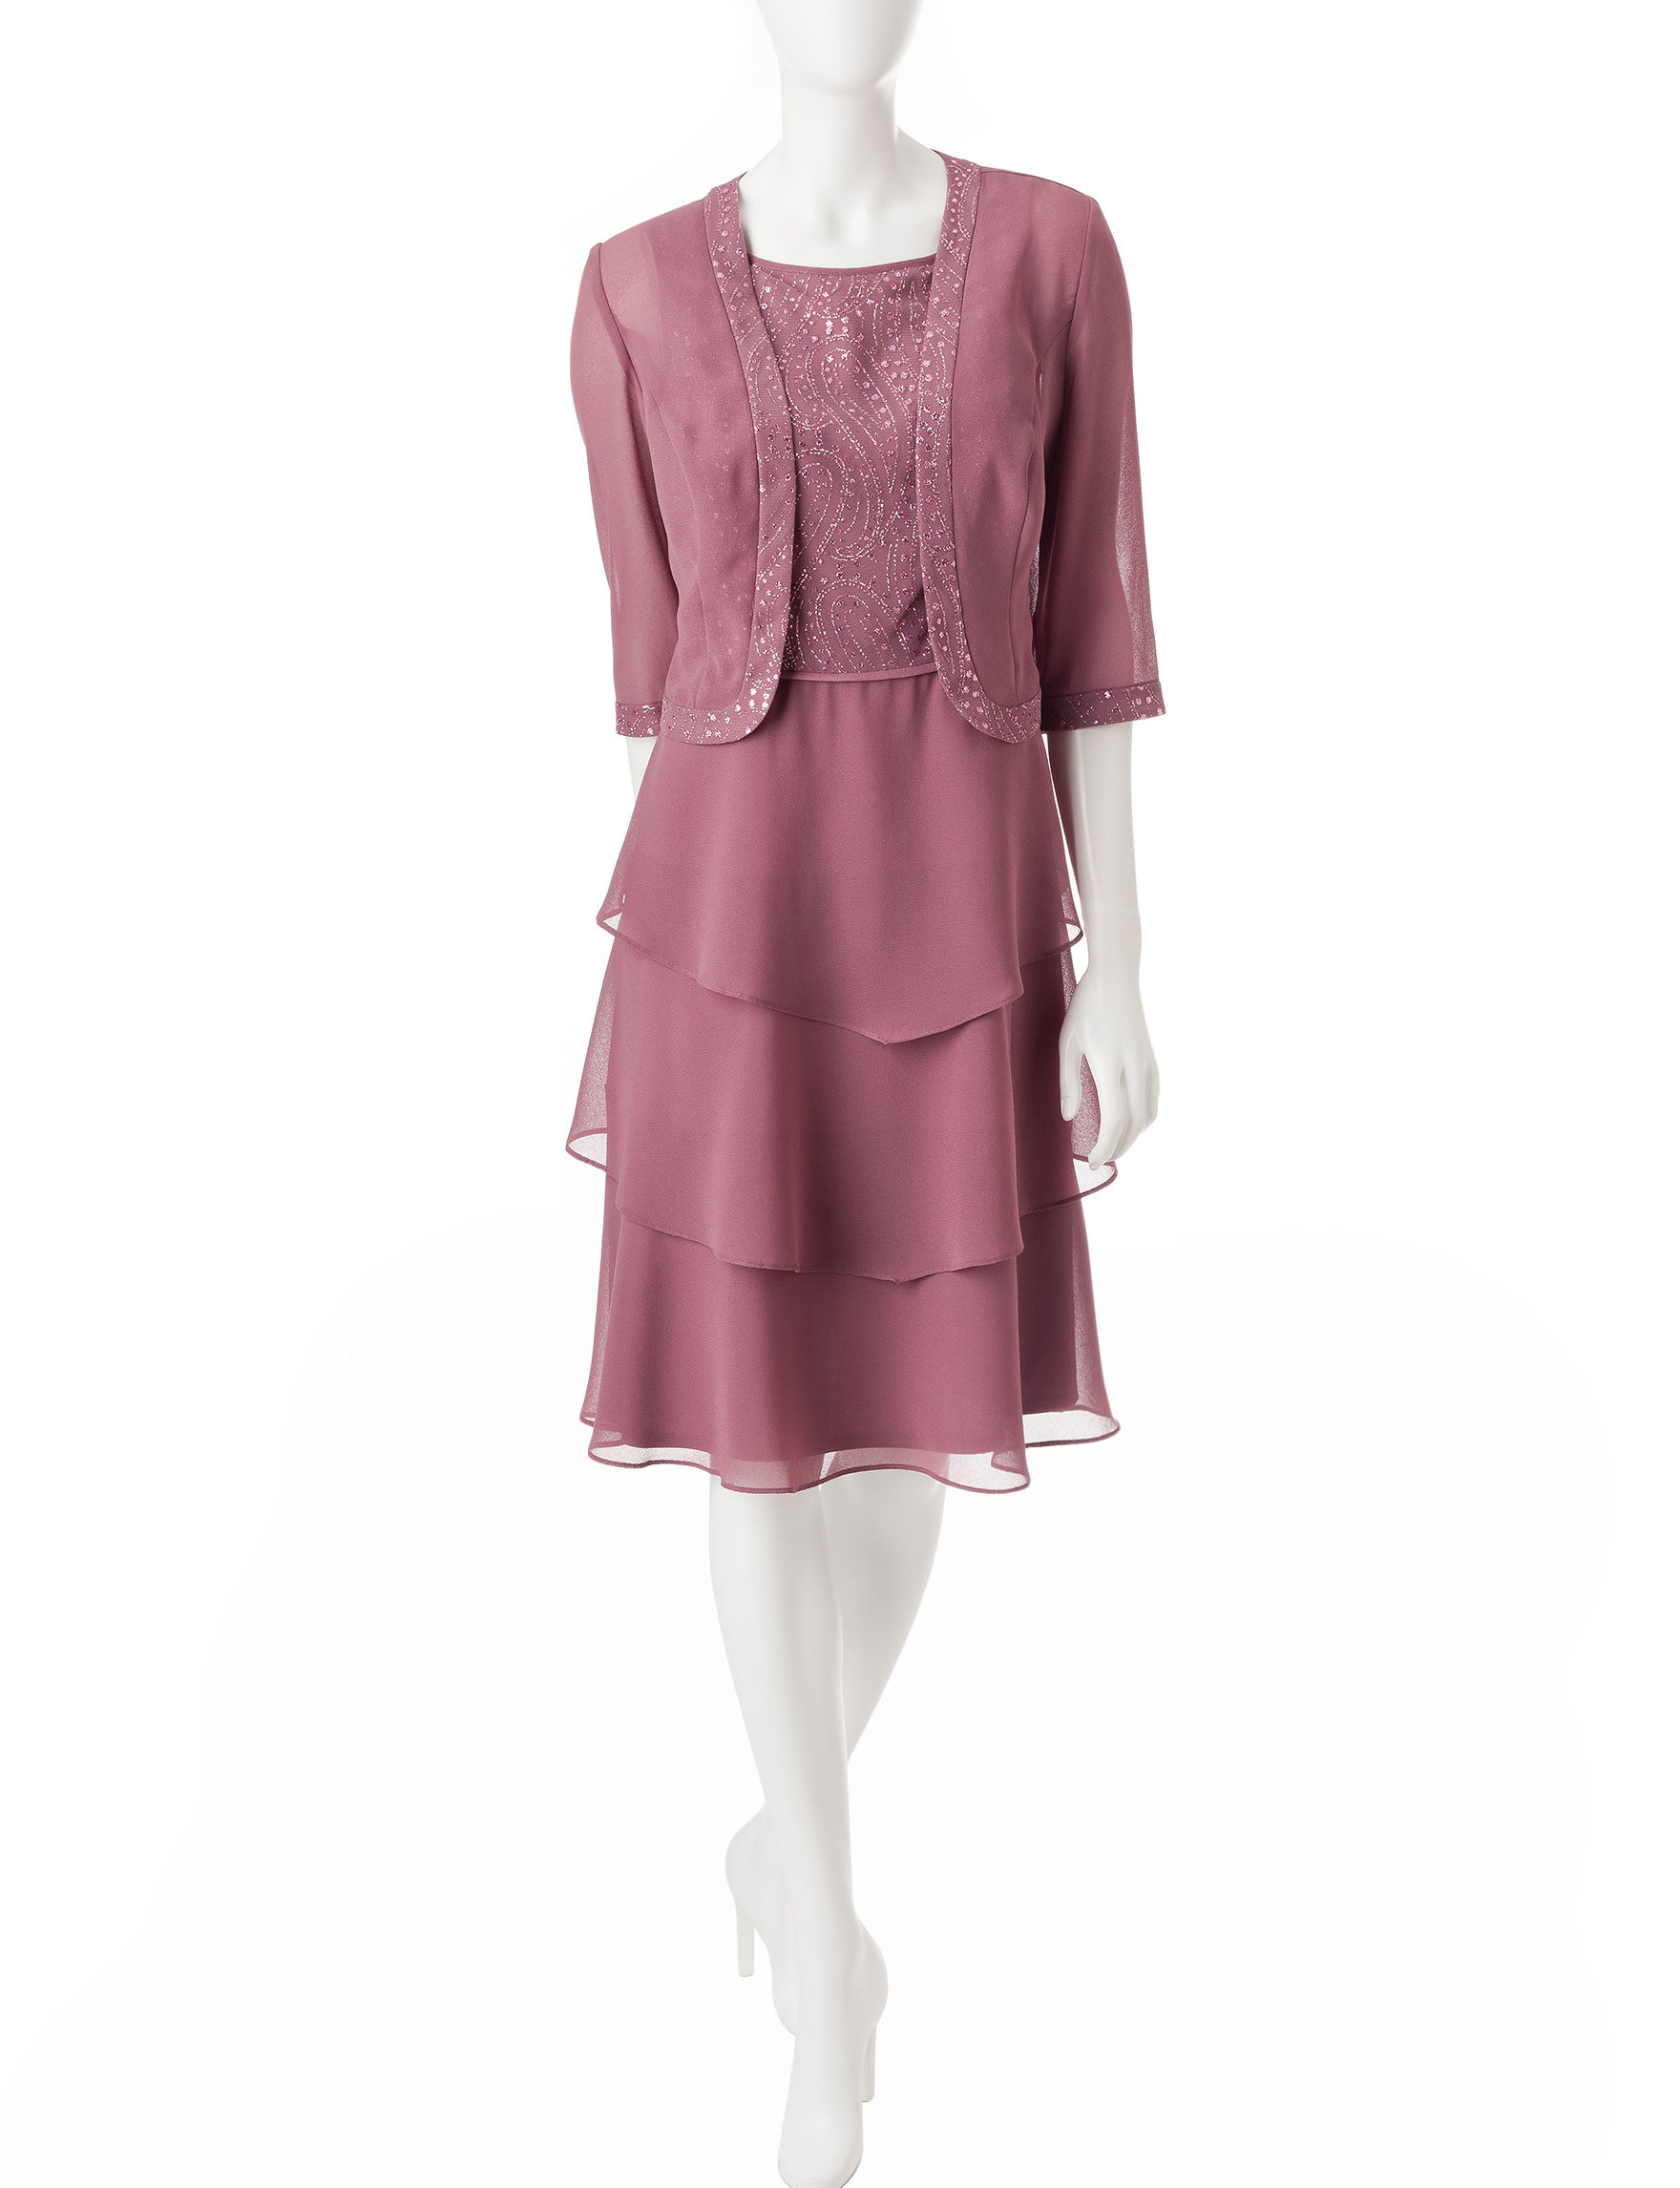 Dana Kay Rose Evening & Formal Jacket Dresses